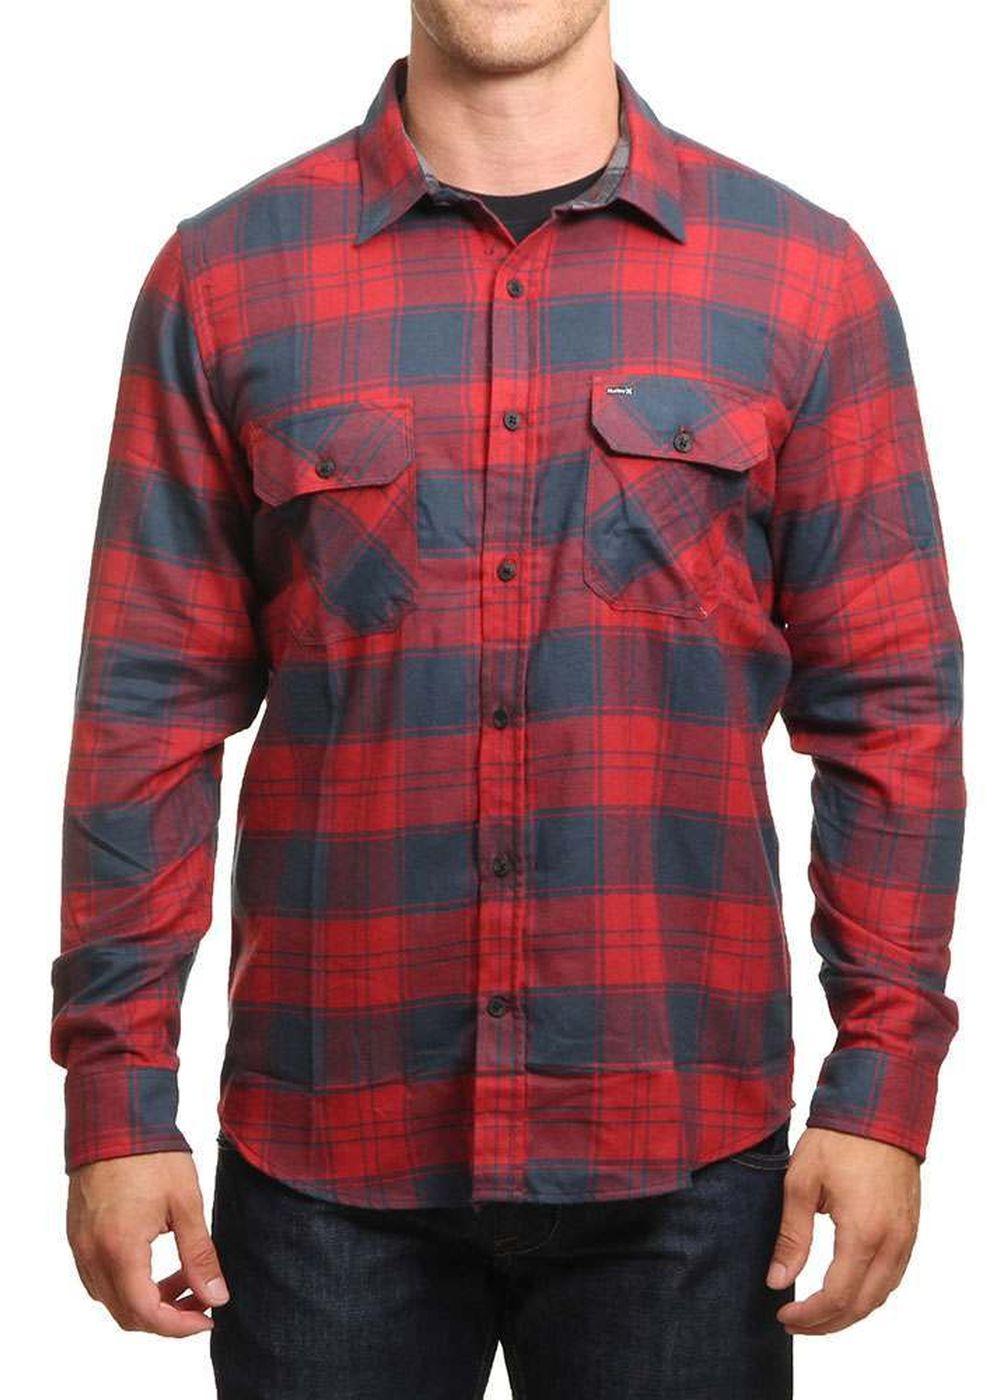 hurley-cora-drifit-shirt-team-red